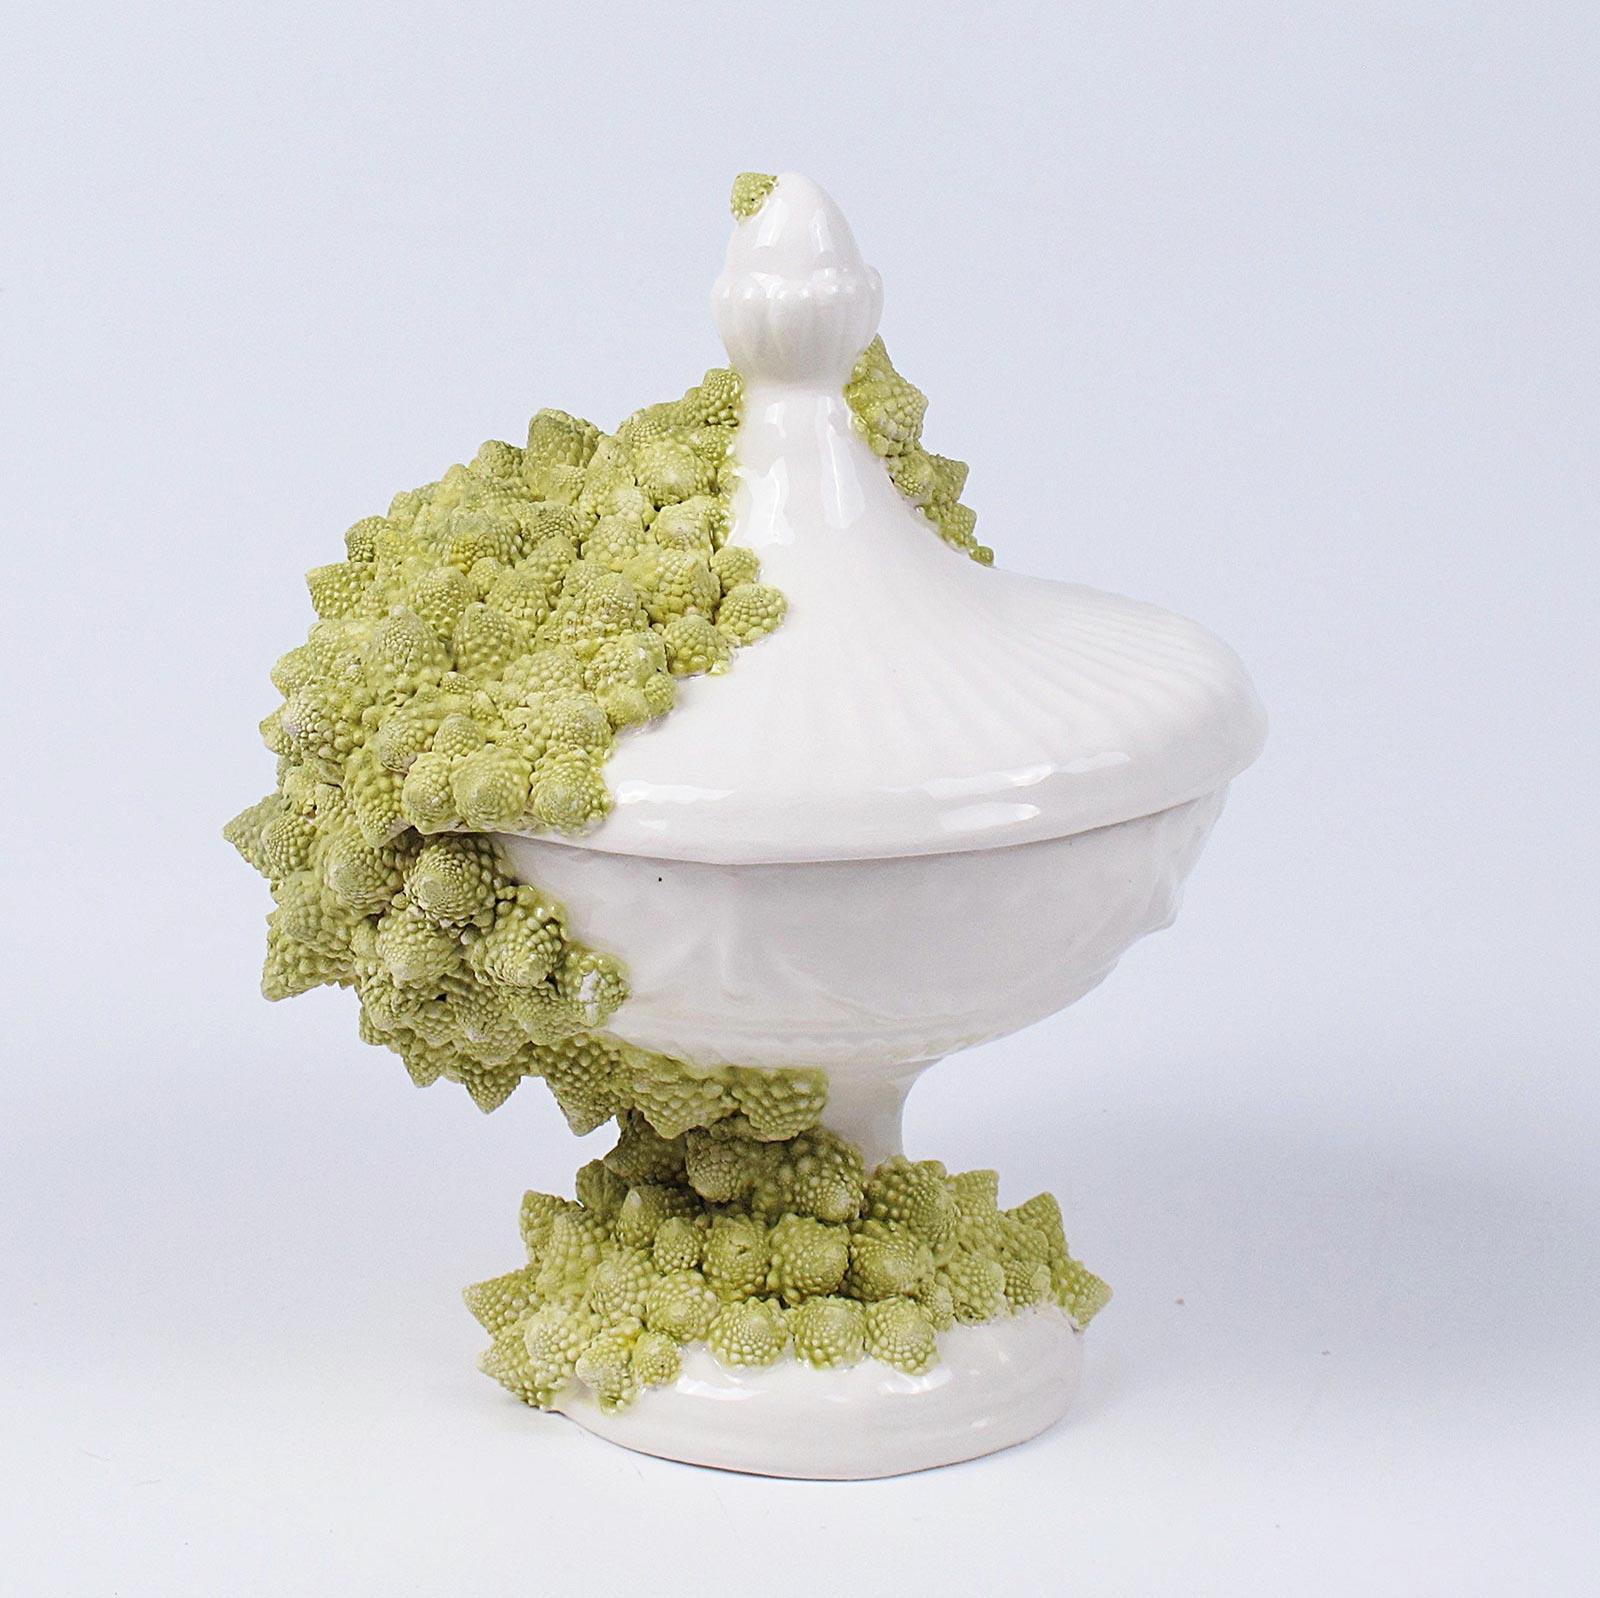 1-Caterina-Sbrana,-Autosomiglianza,-ceramica-bianca-e-engobbio-2019-